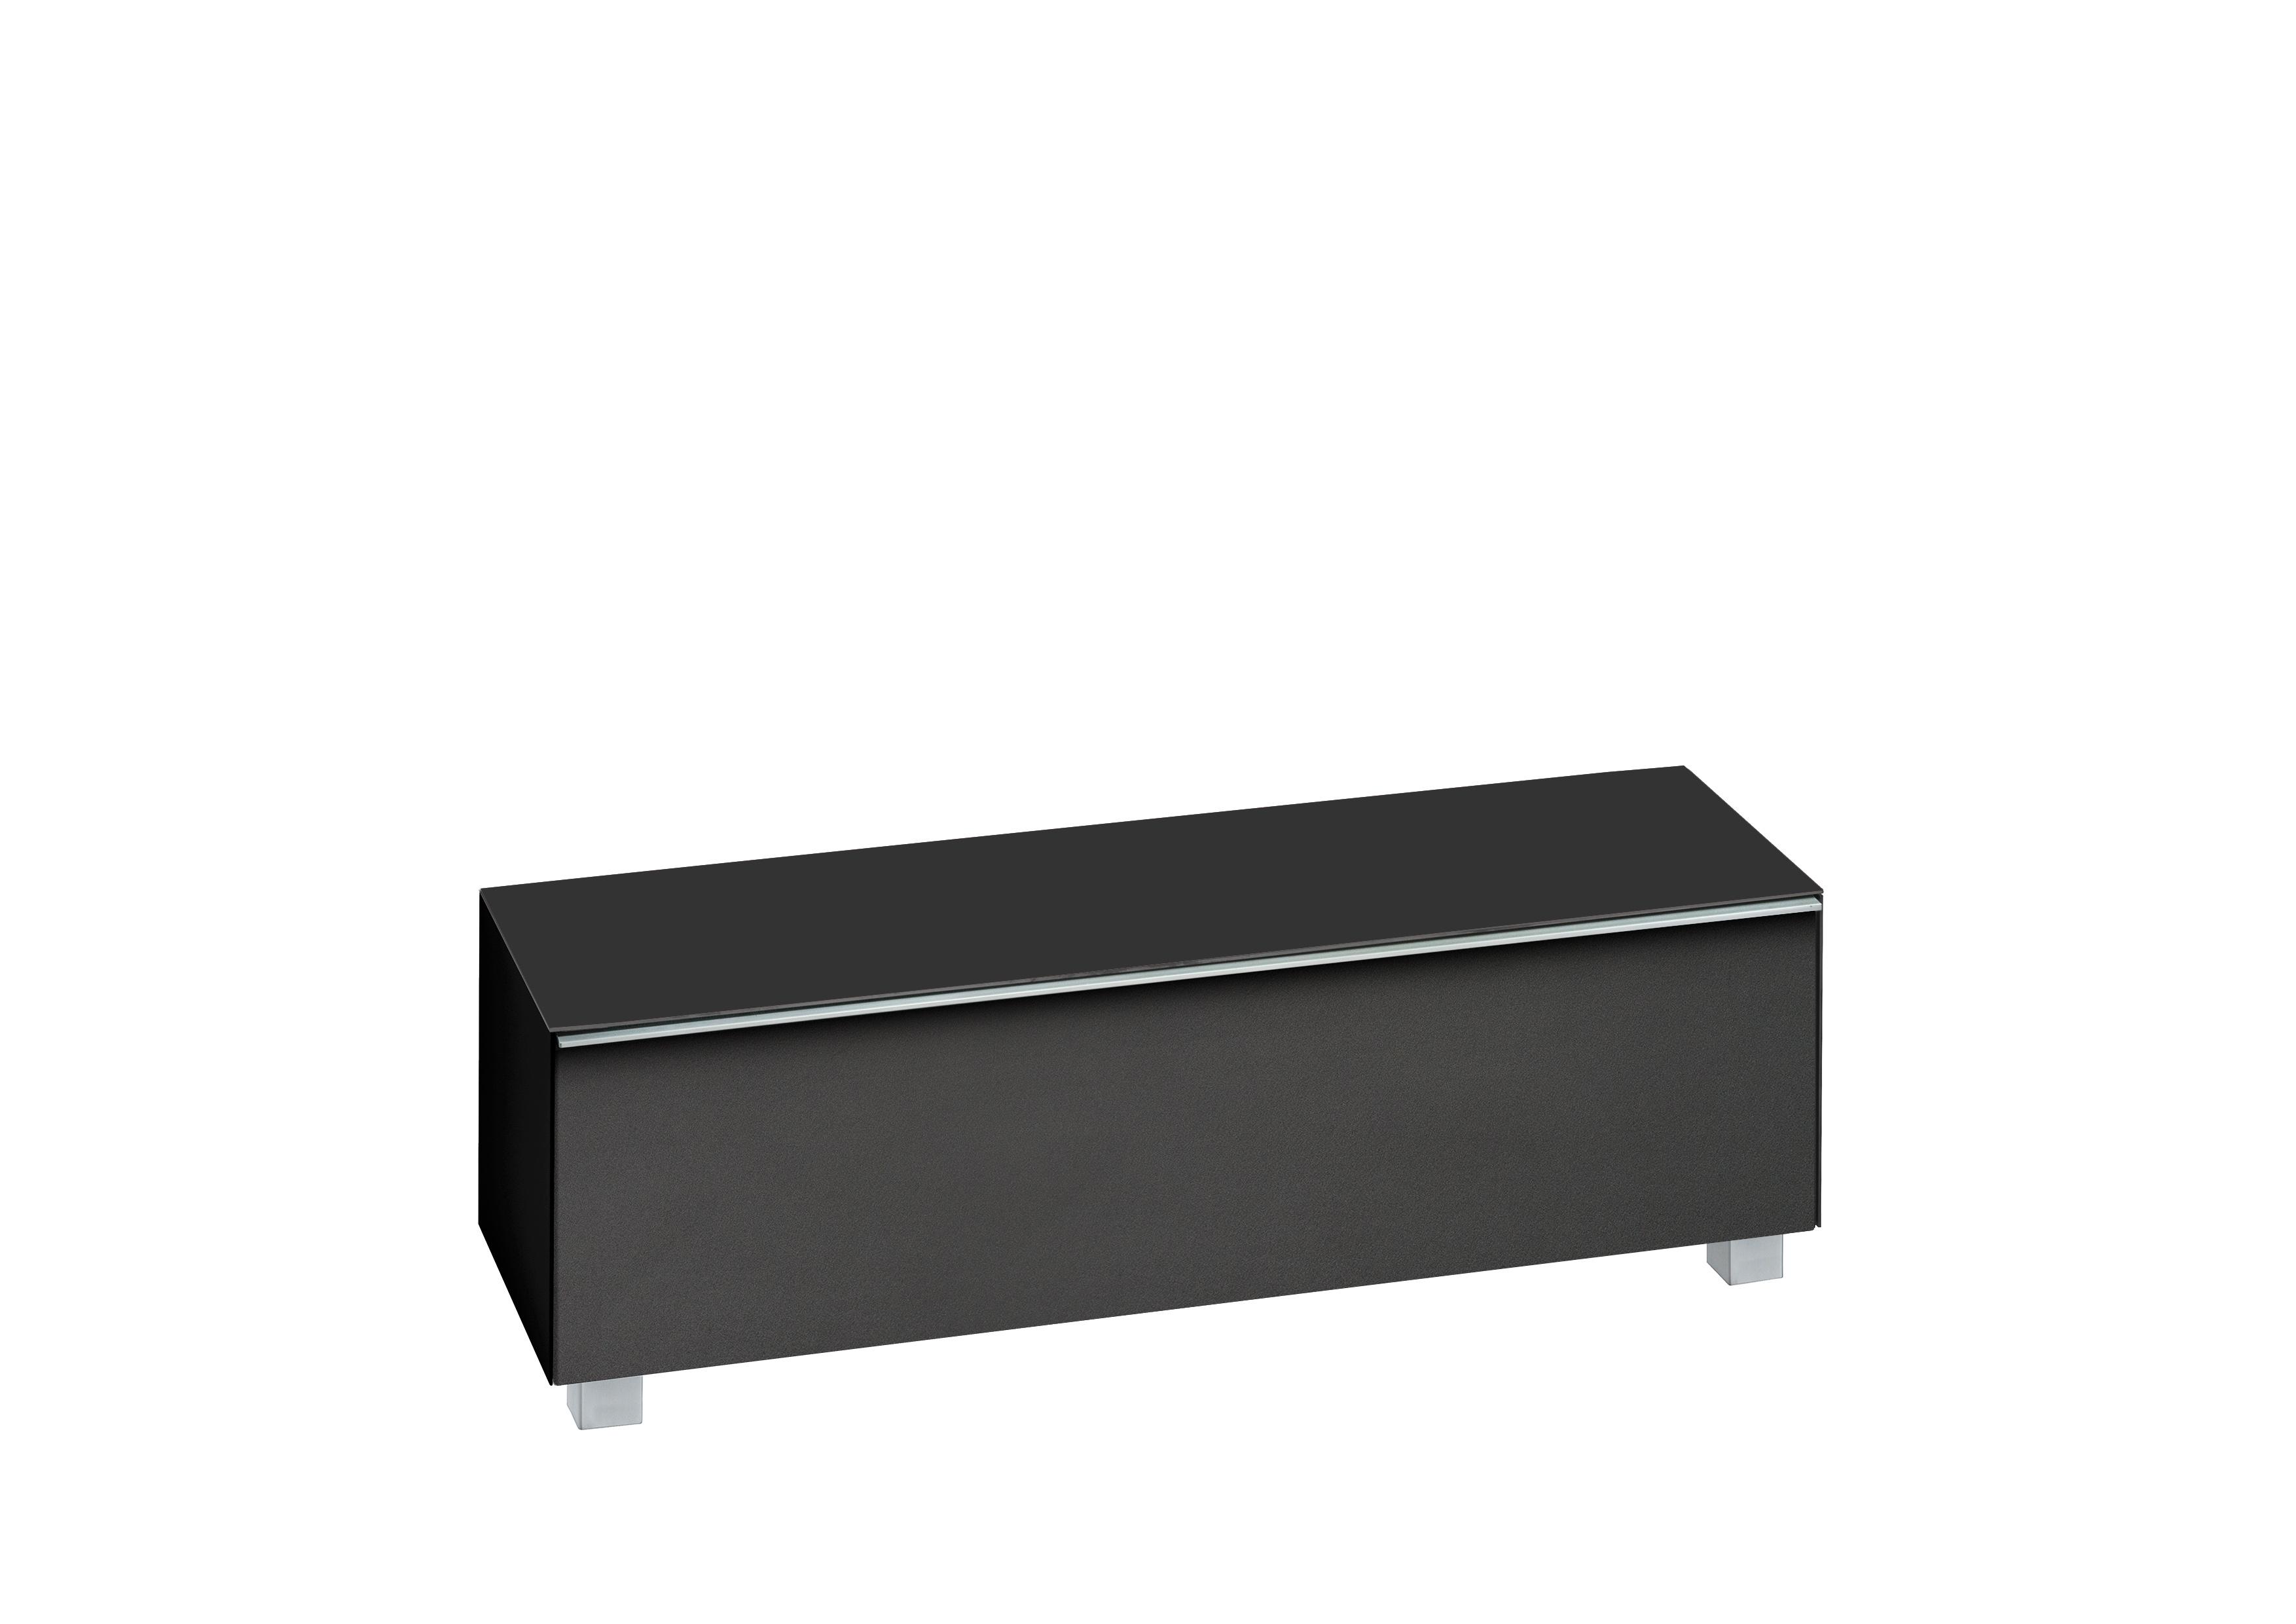 Meuble Tv Design Avec Ampli Home Cinema 140 Cm En Verre Noir Mat